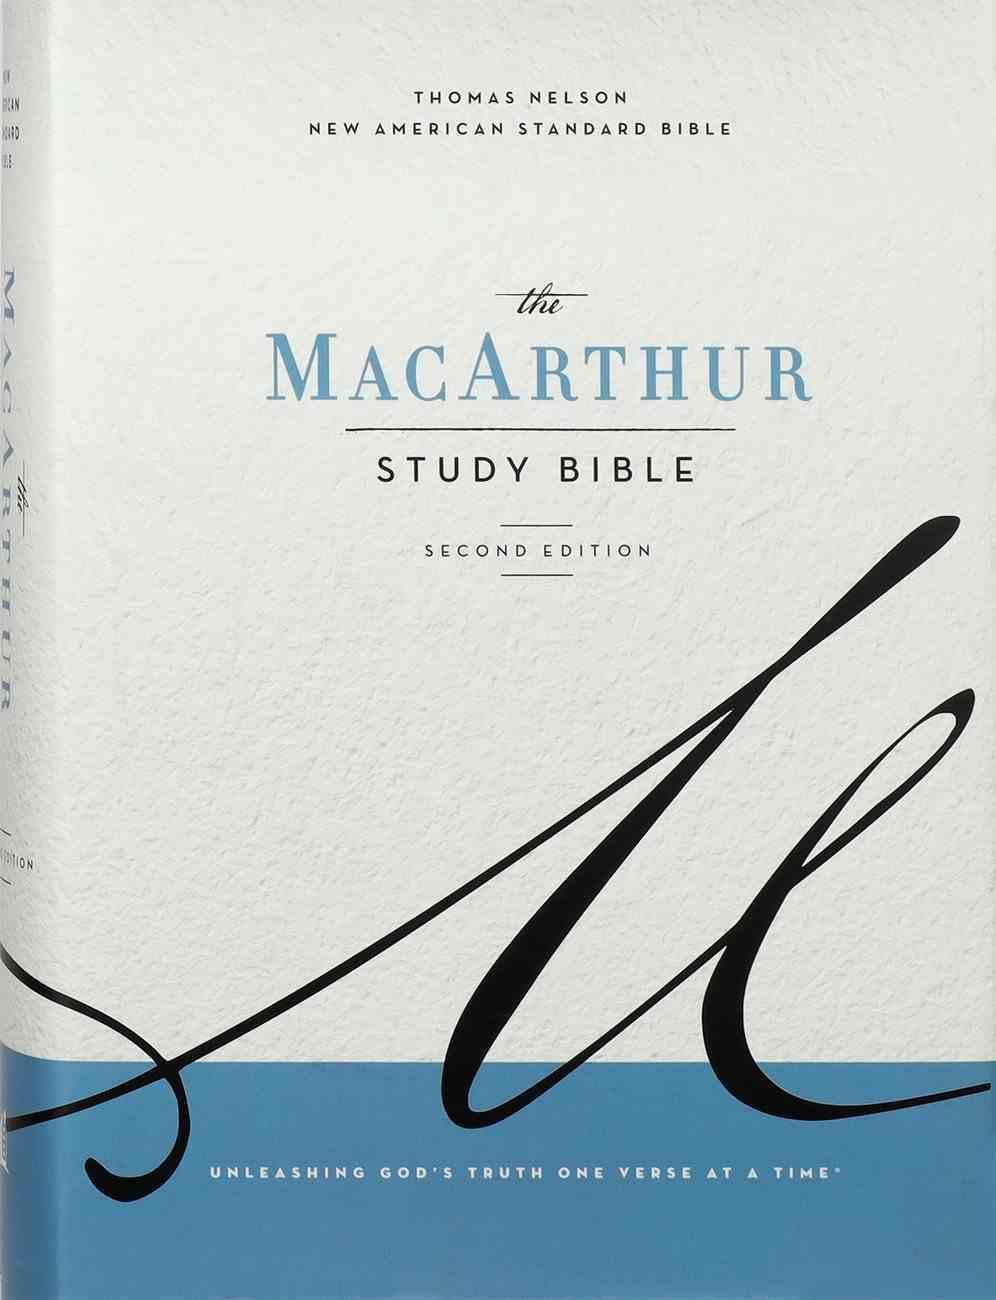 NASB Macarthur Study Bible 2nd Edition Gray Hardback